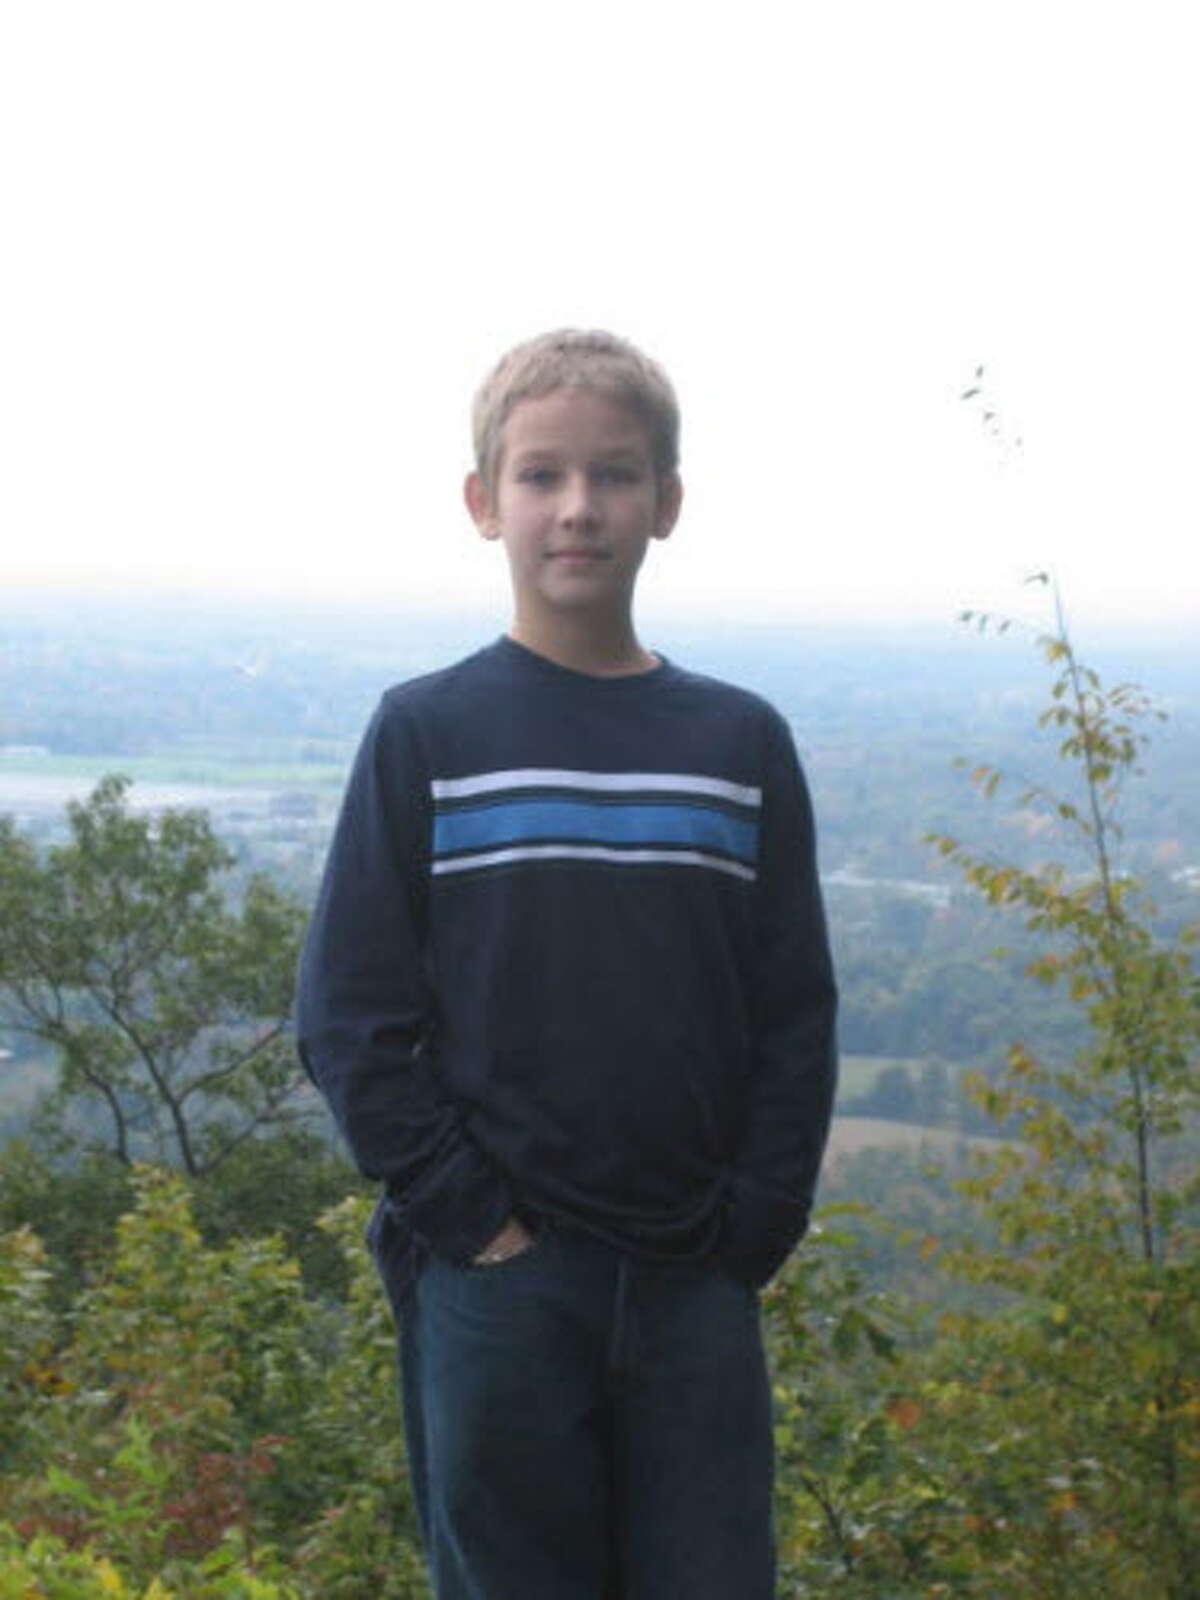 Nicholas Naumkin of Wilton, who was killed Dec. 22, 2010. (Naumkin family photo)